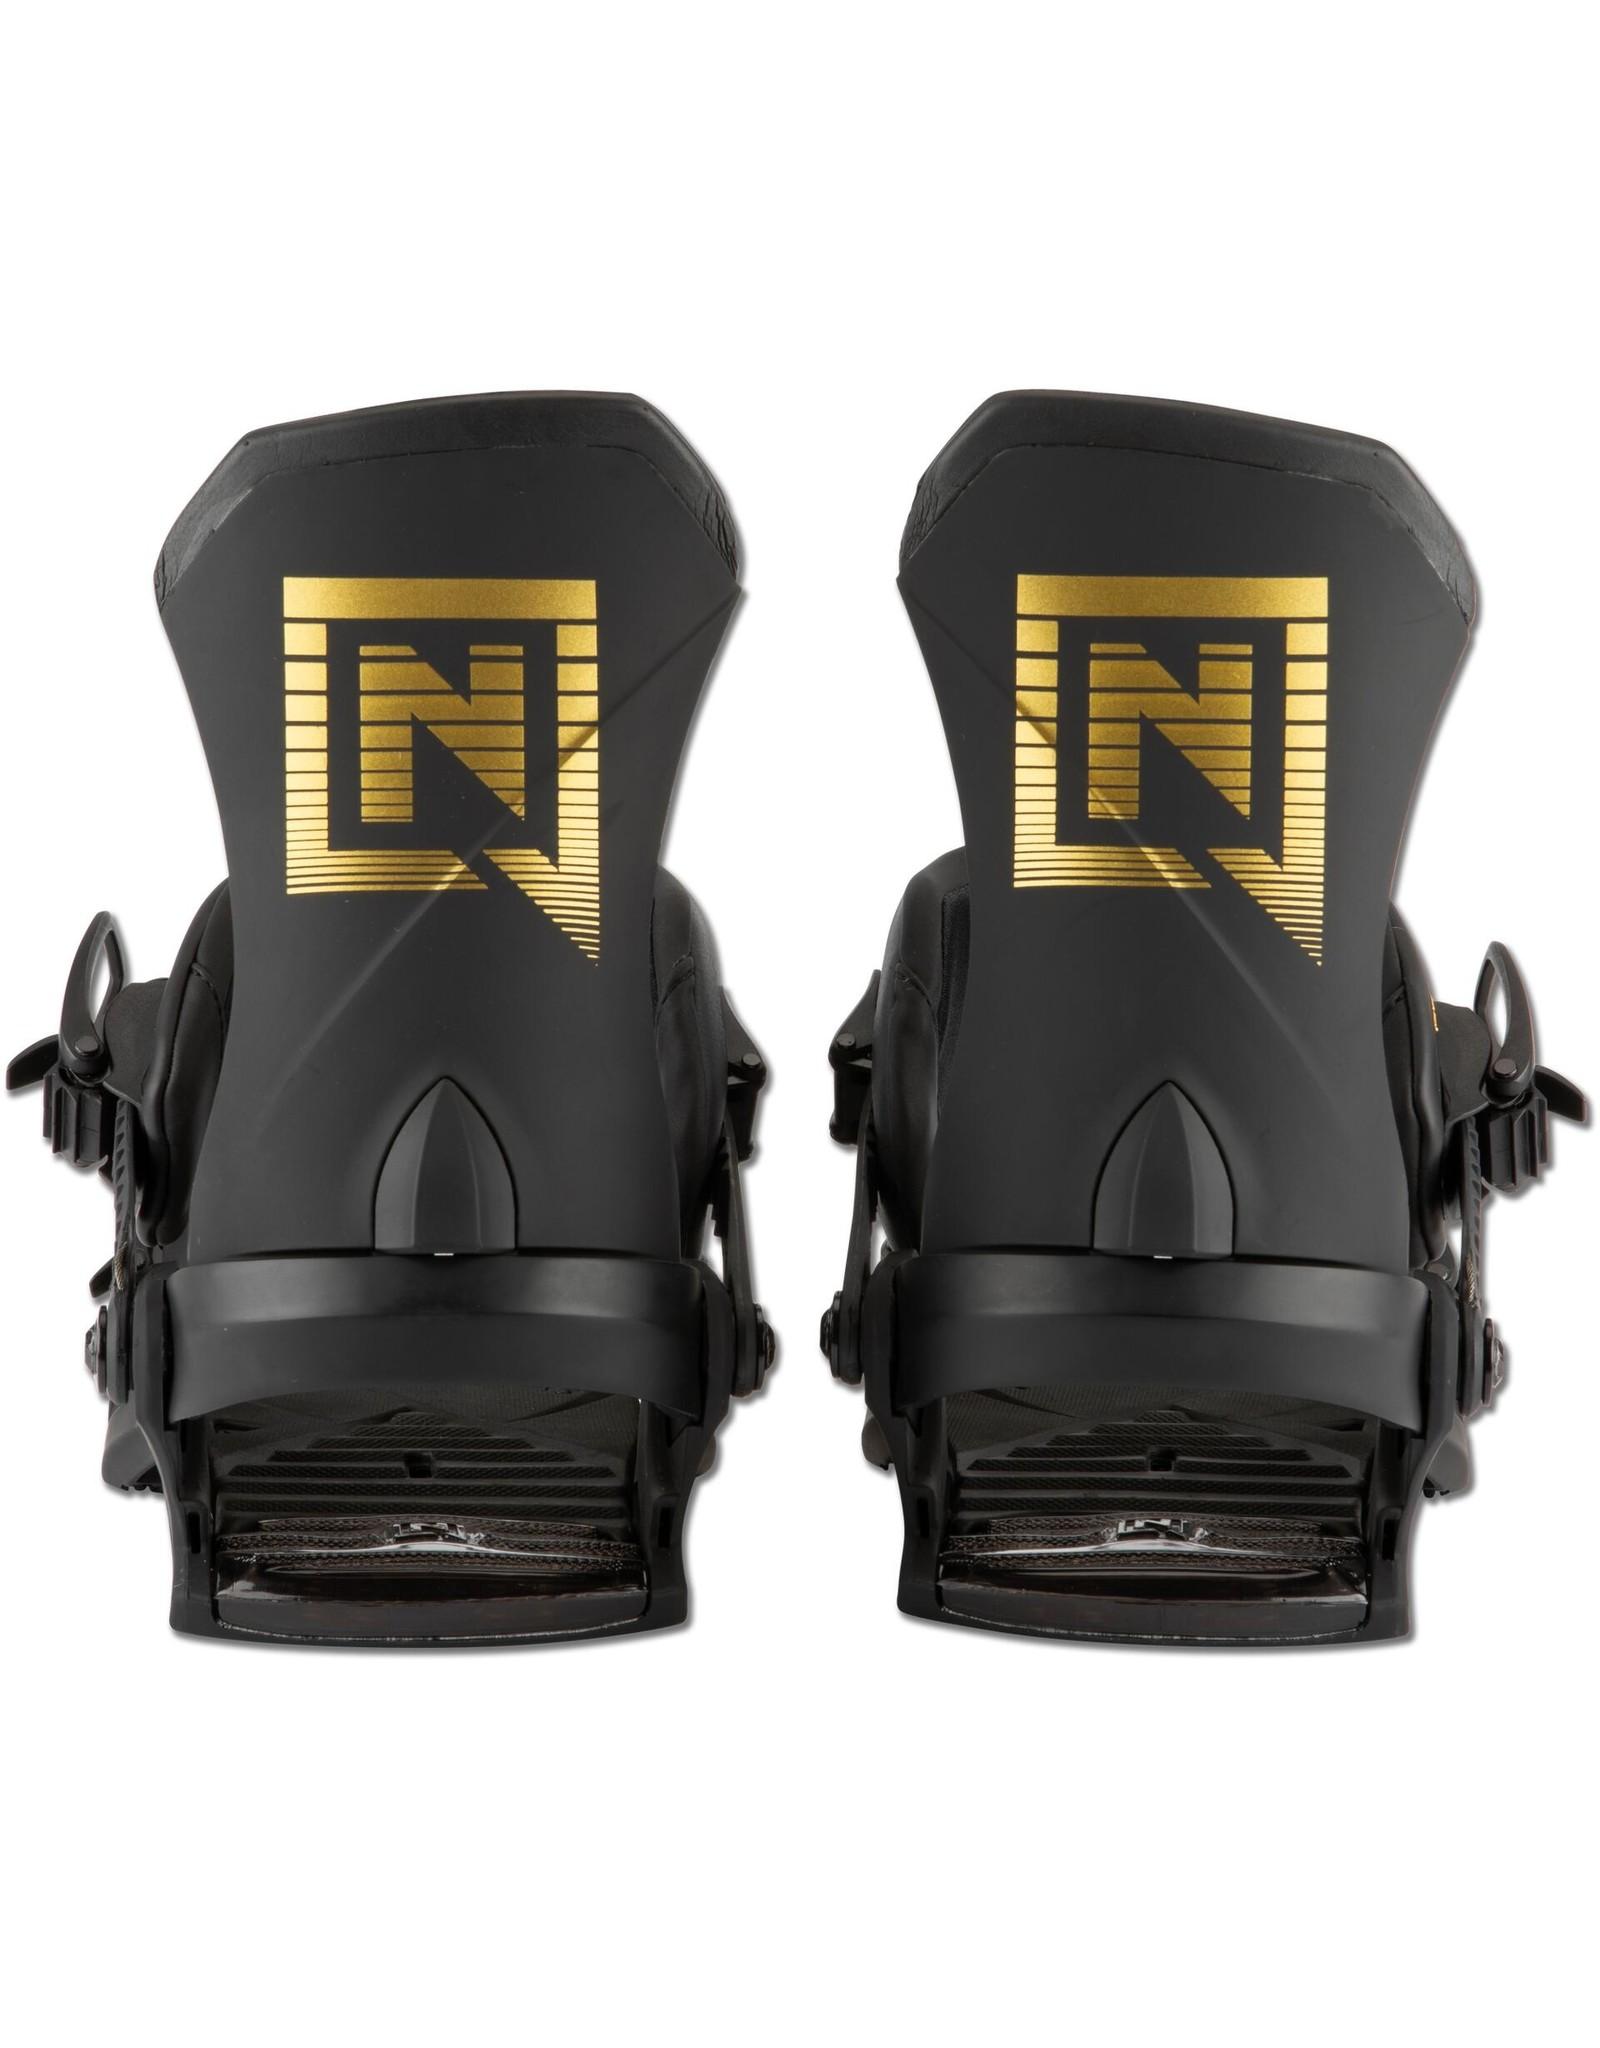 NITRO NITRO - TEAM PRO - GOLDY -